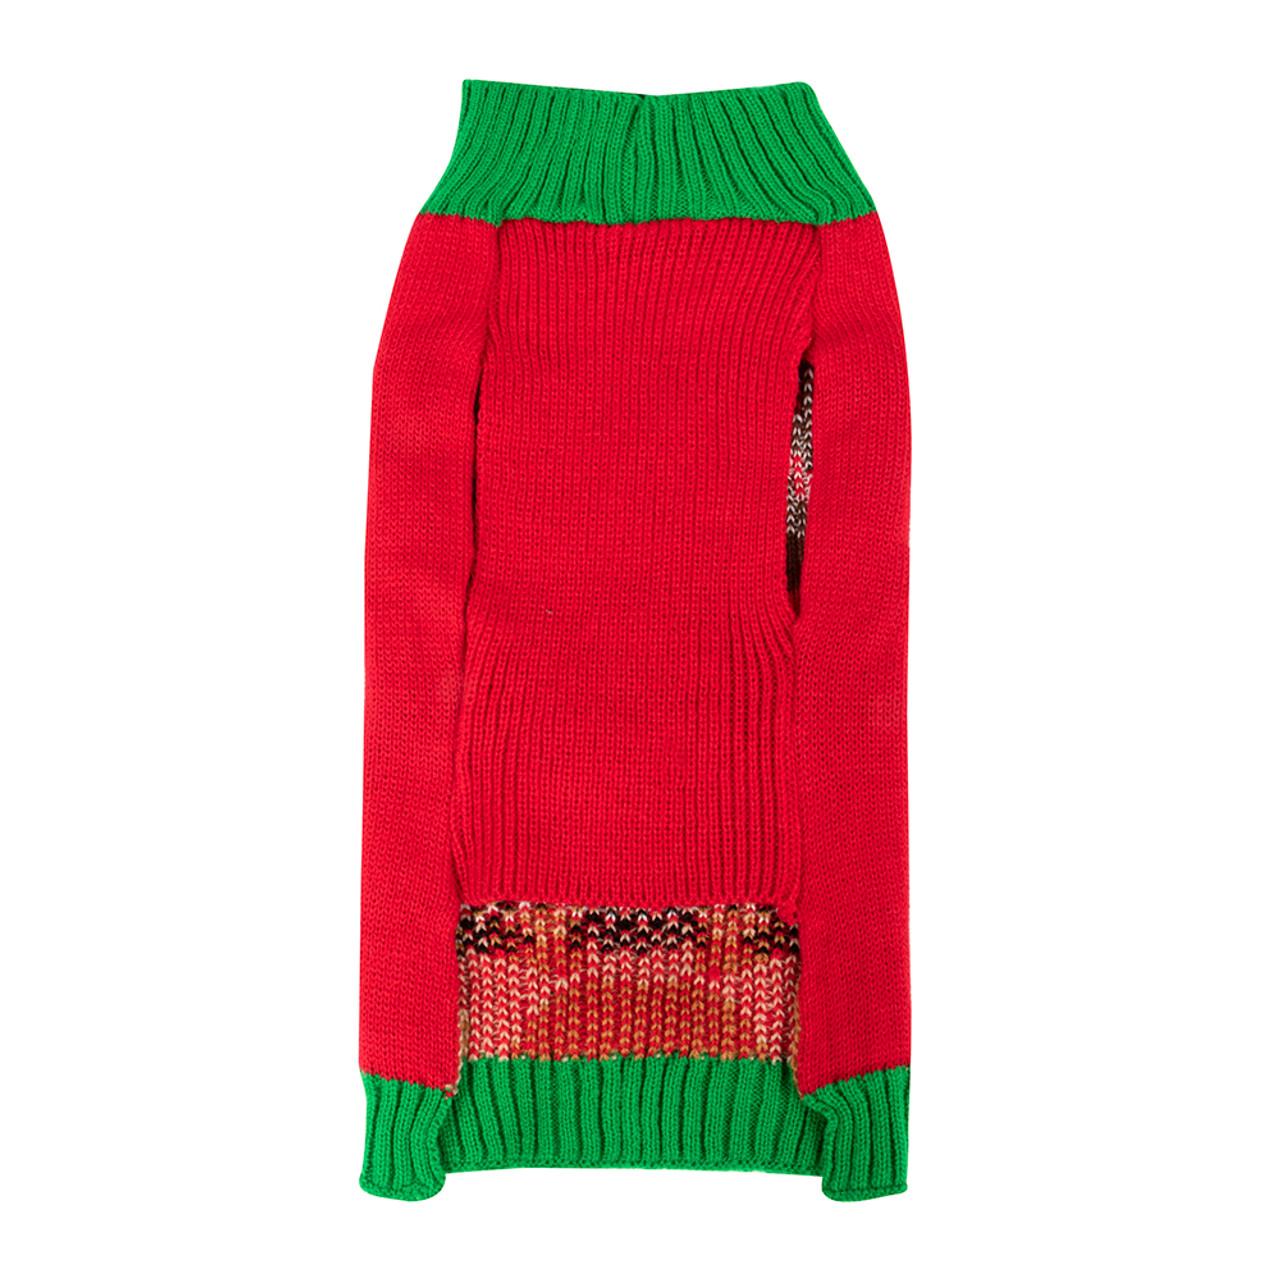 SimplyDog Red Green Peeking Reindeer Dog Sweater